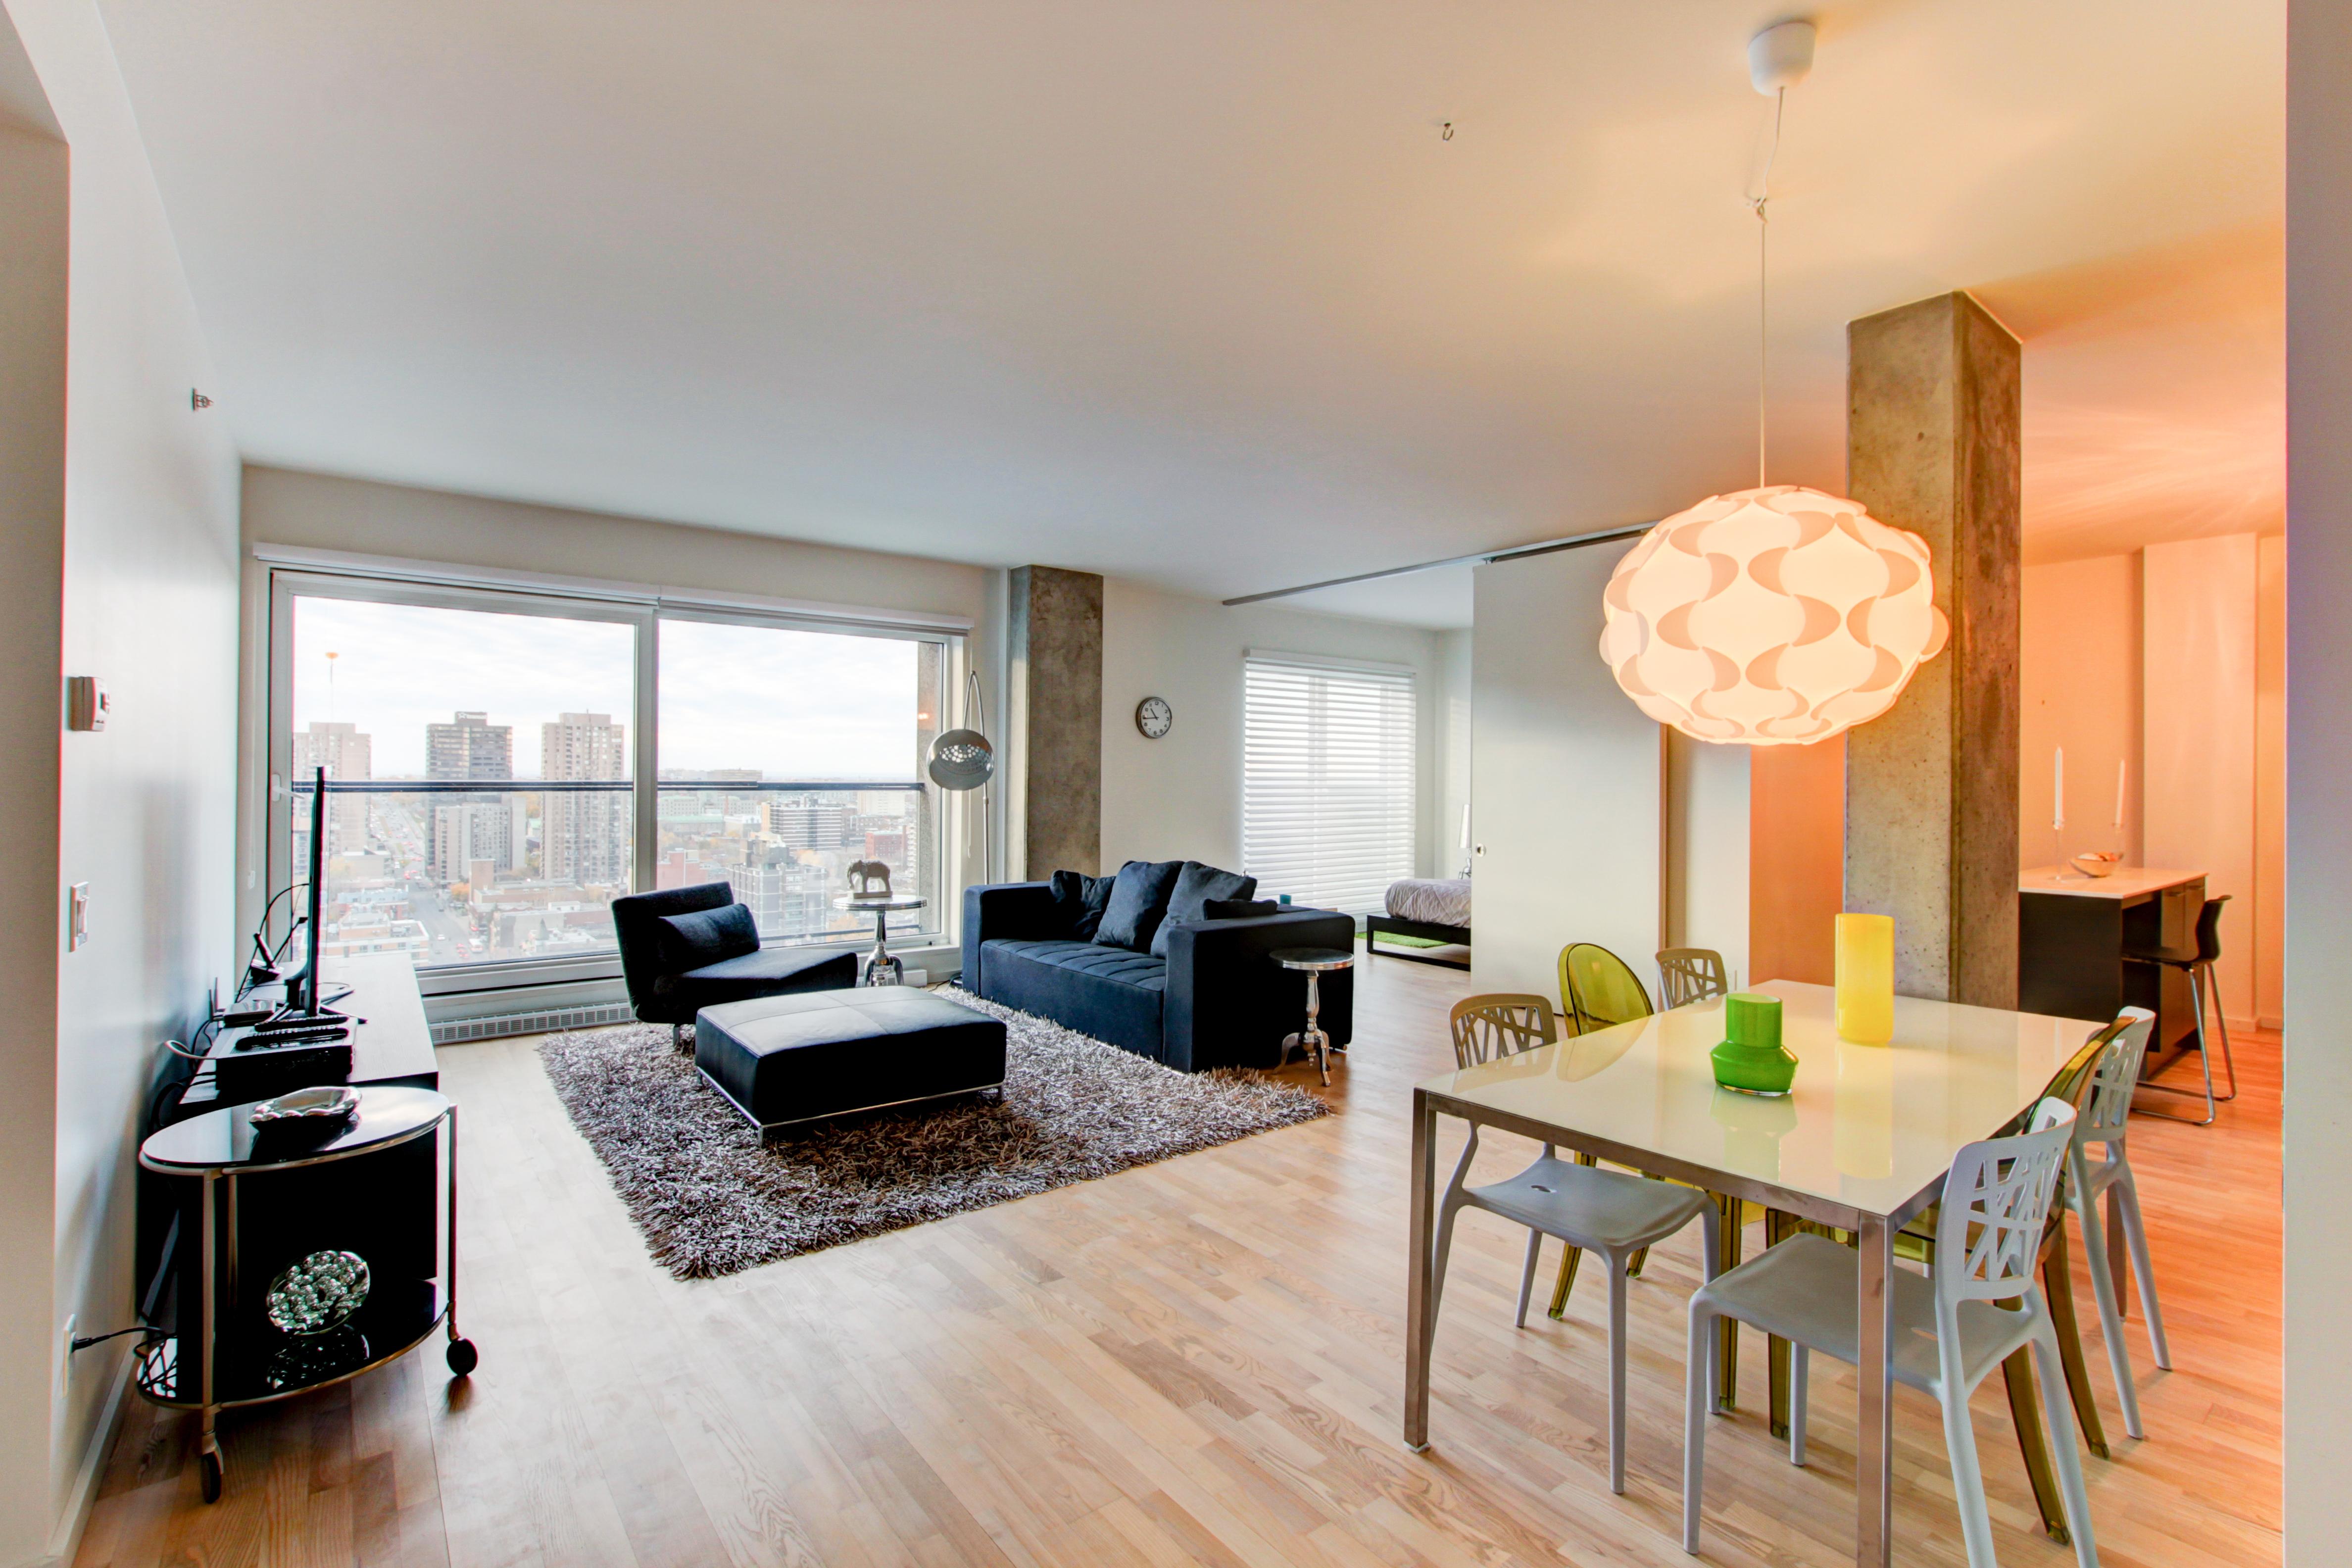 condo lou ville marie montreal acheter condo ville marie montreal. Black Bedroom Furniture Sets. Home Design Ideas